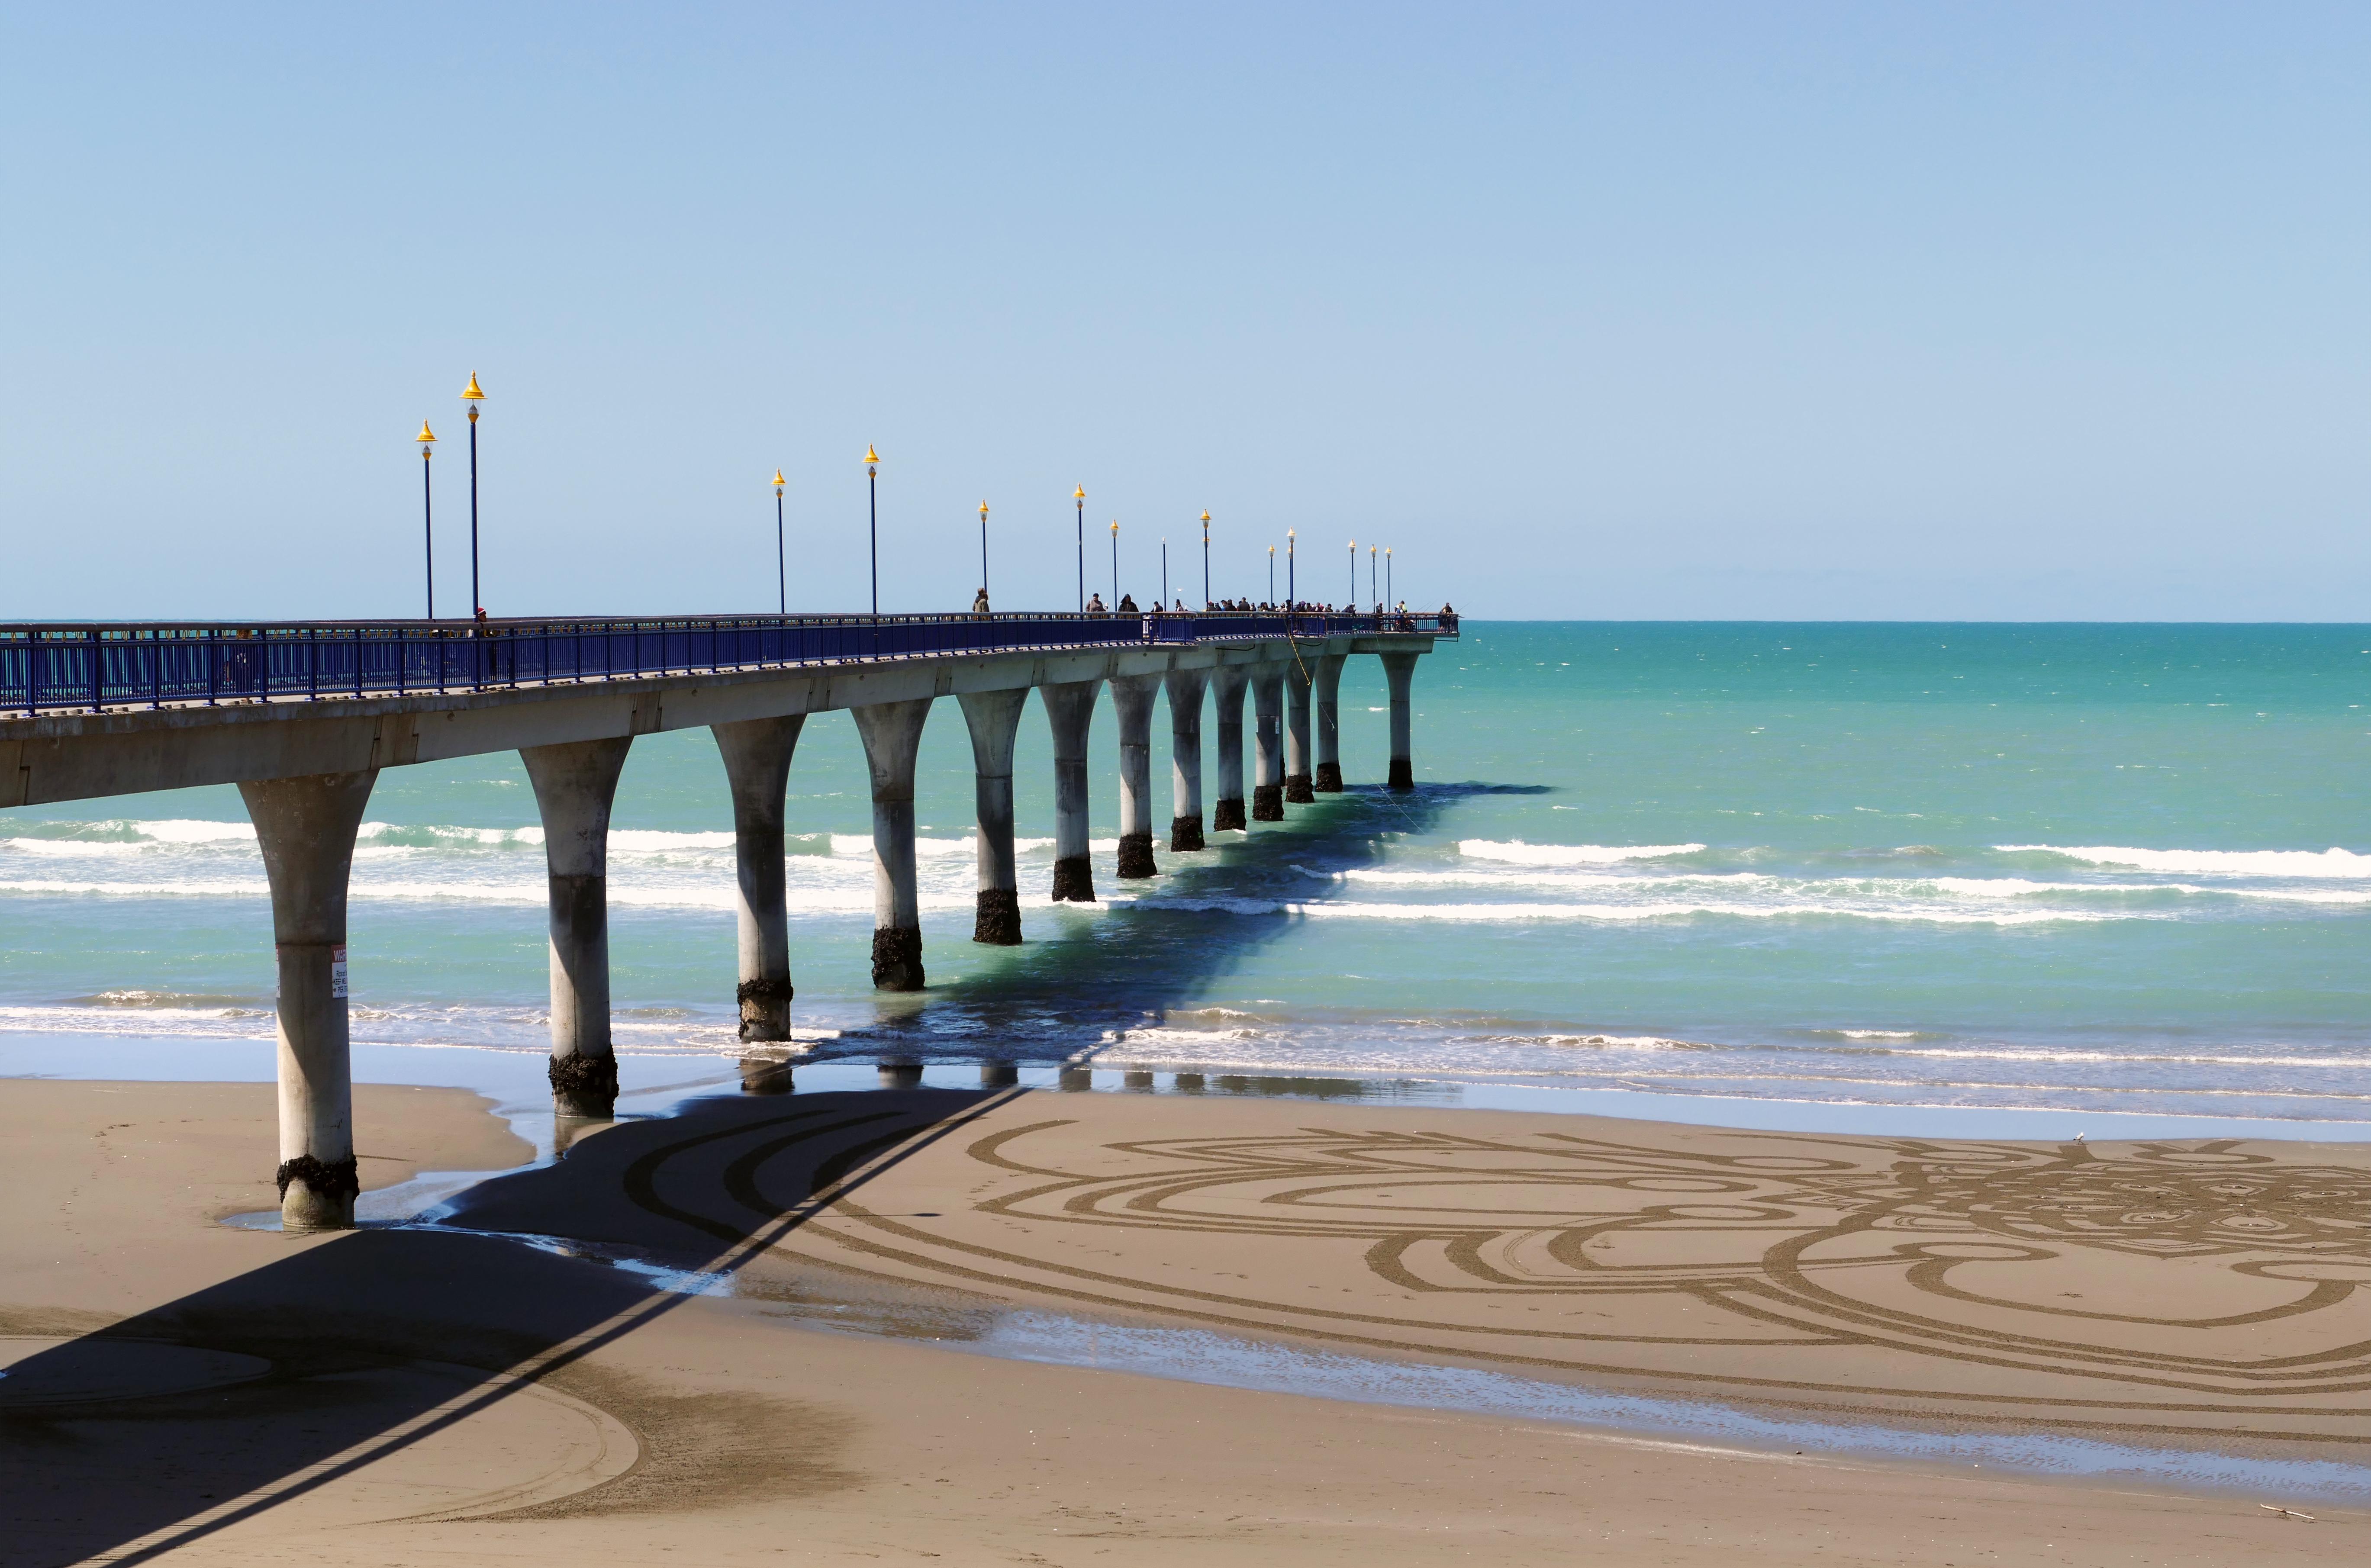 New brighton pier. christchurch nz. photo